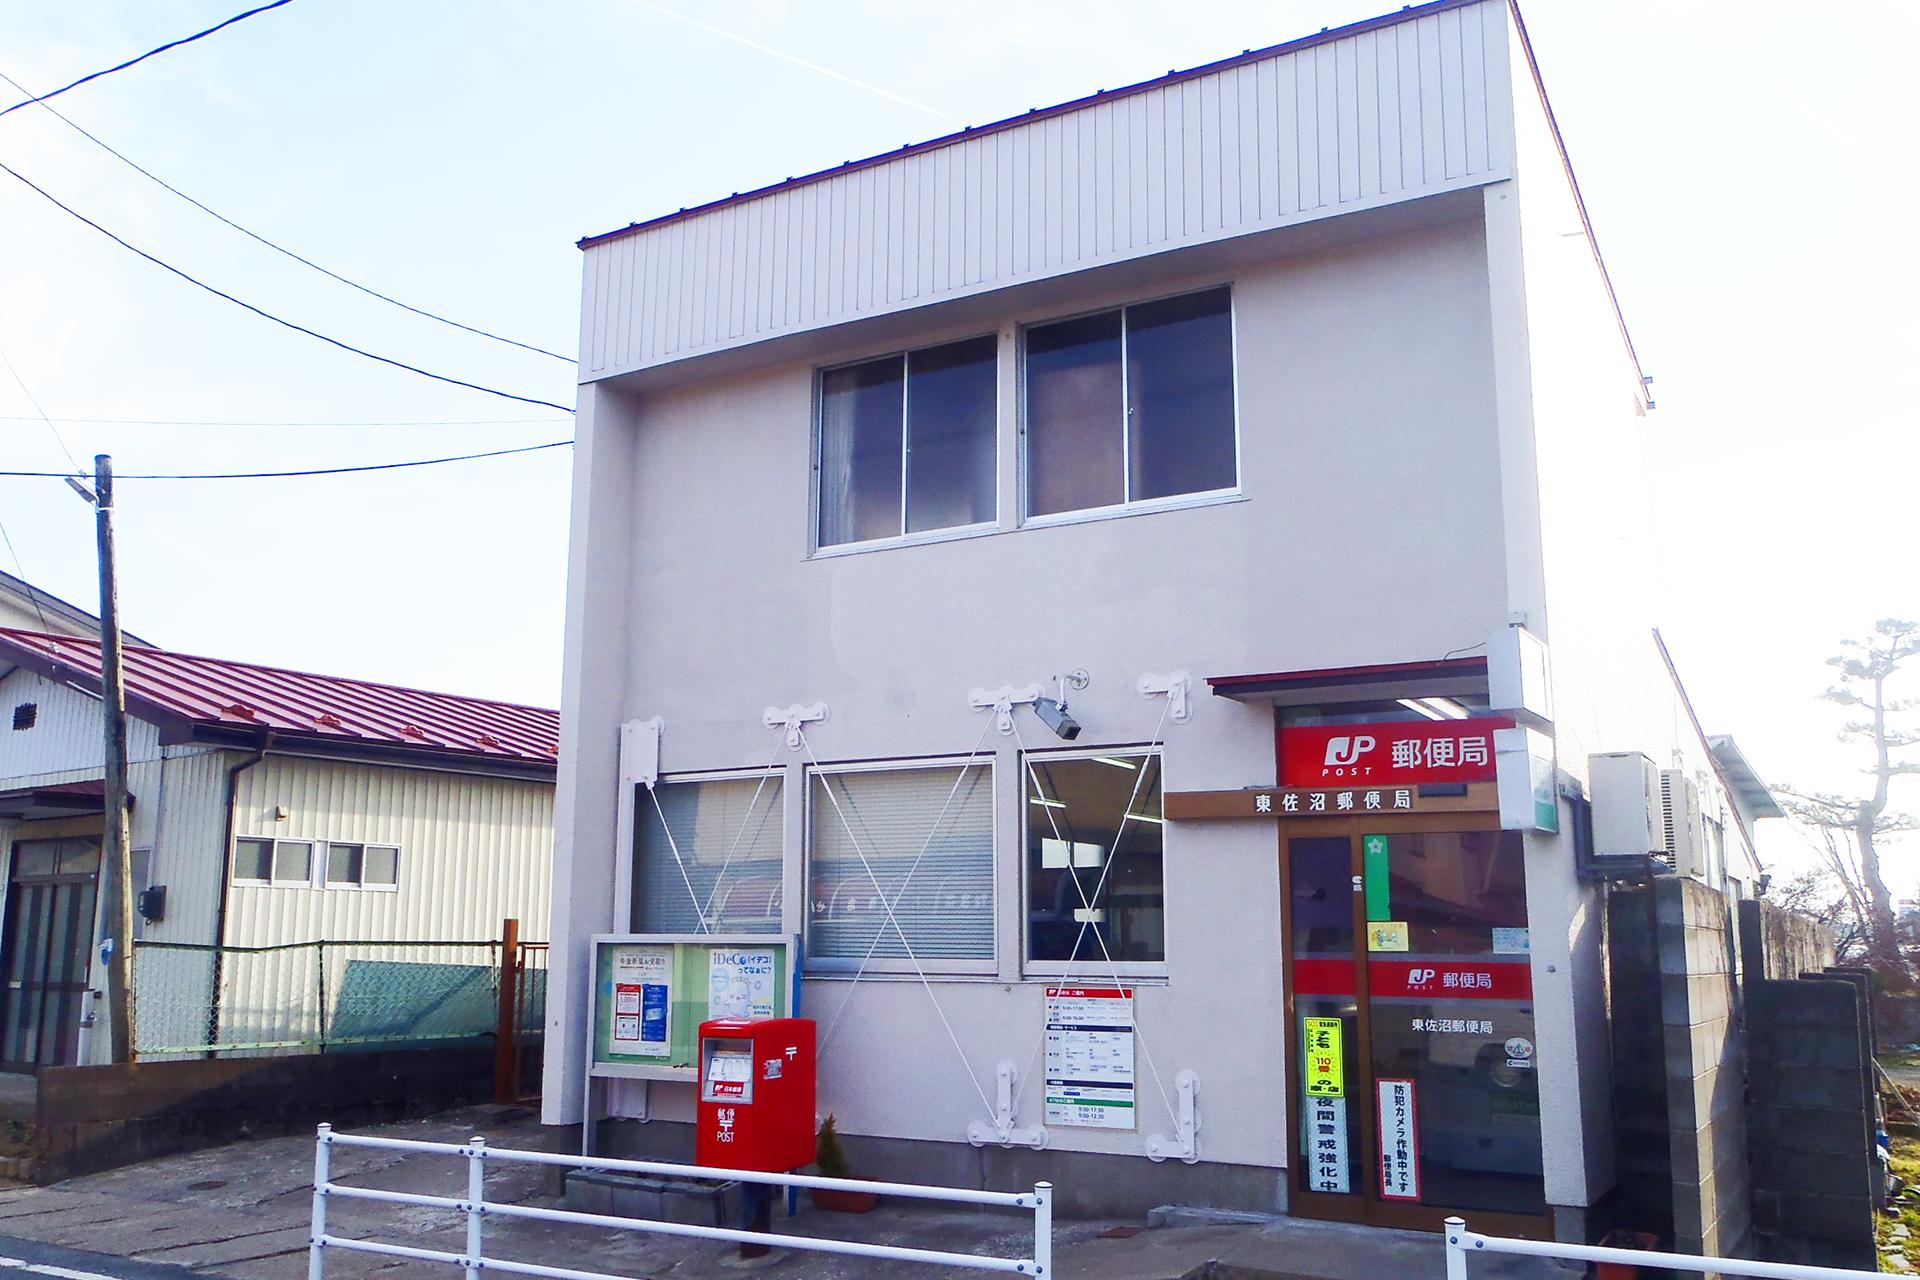 東佐沼郵便局ほか2箇所外壁修繕工事